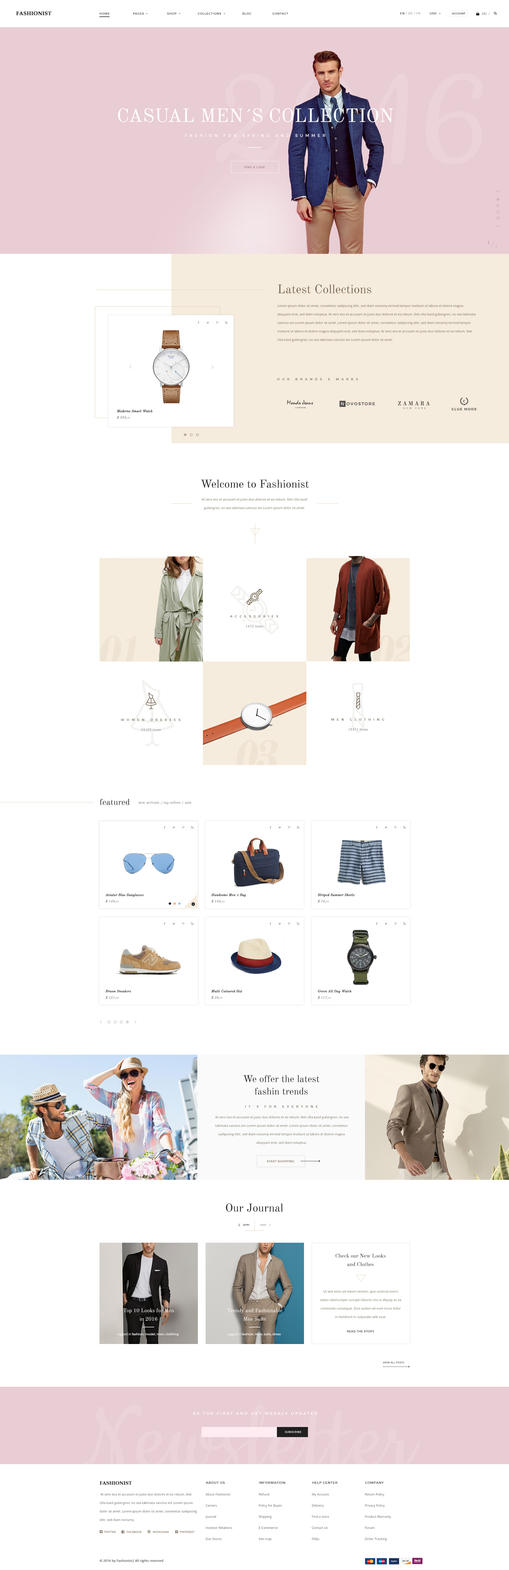 Fashionist - eCommerce Fashion HTML5 Template by KL-Webmedia